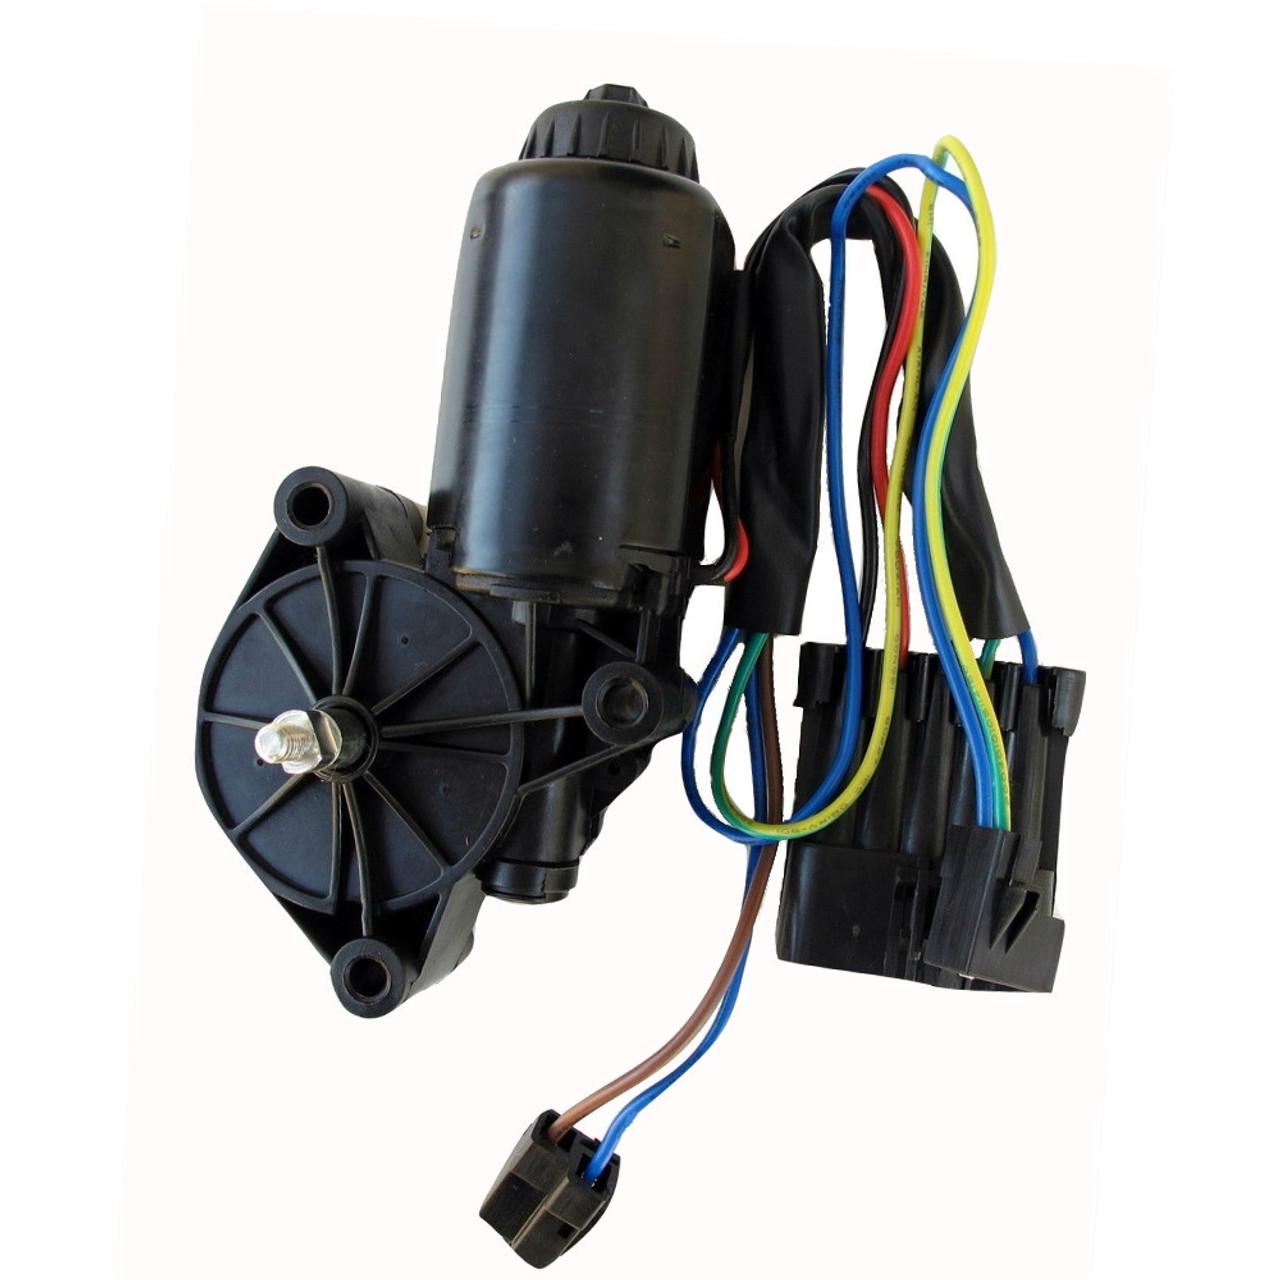 small resolution of new 1998 2002 firebird headlight actuator motor wire harness rh westcoast autoparts com